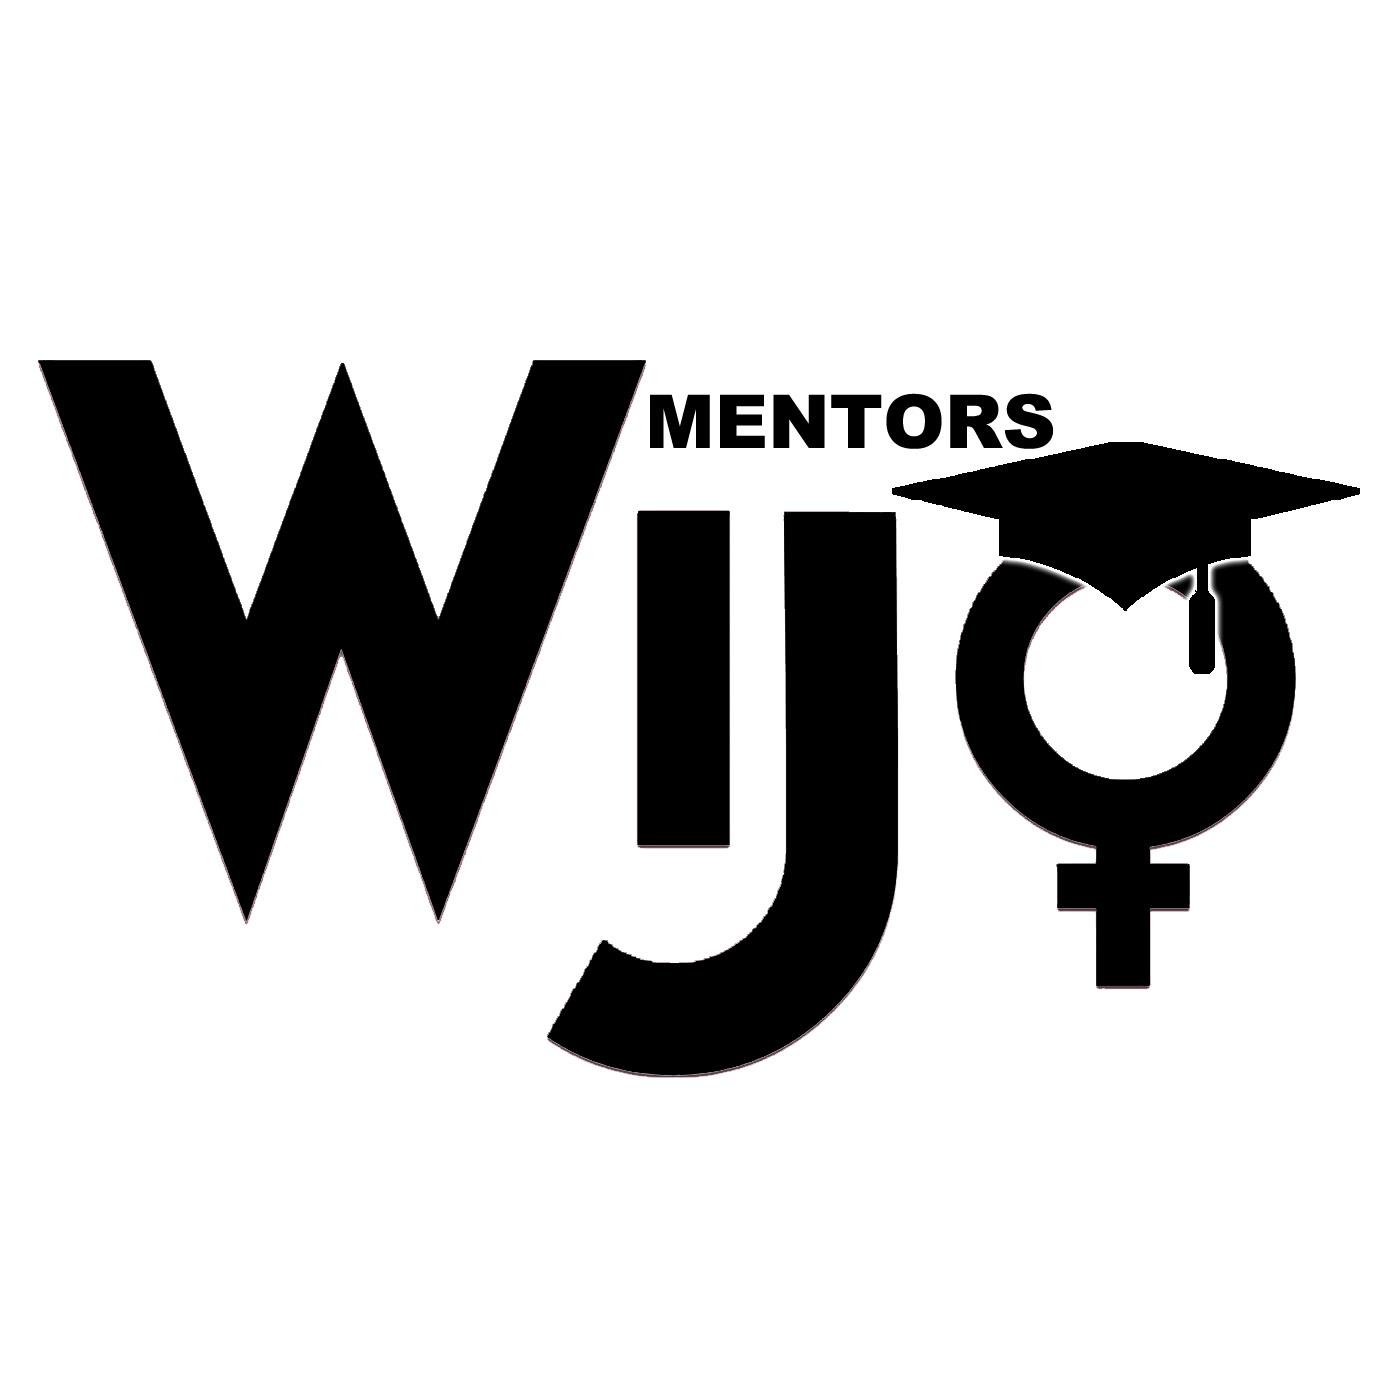 Wijo Mentors Black on white